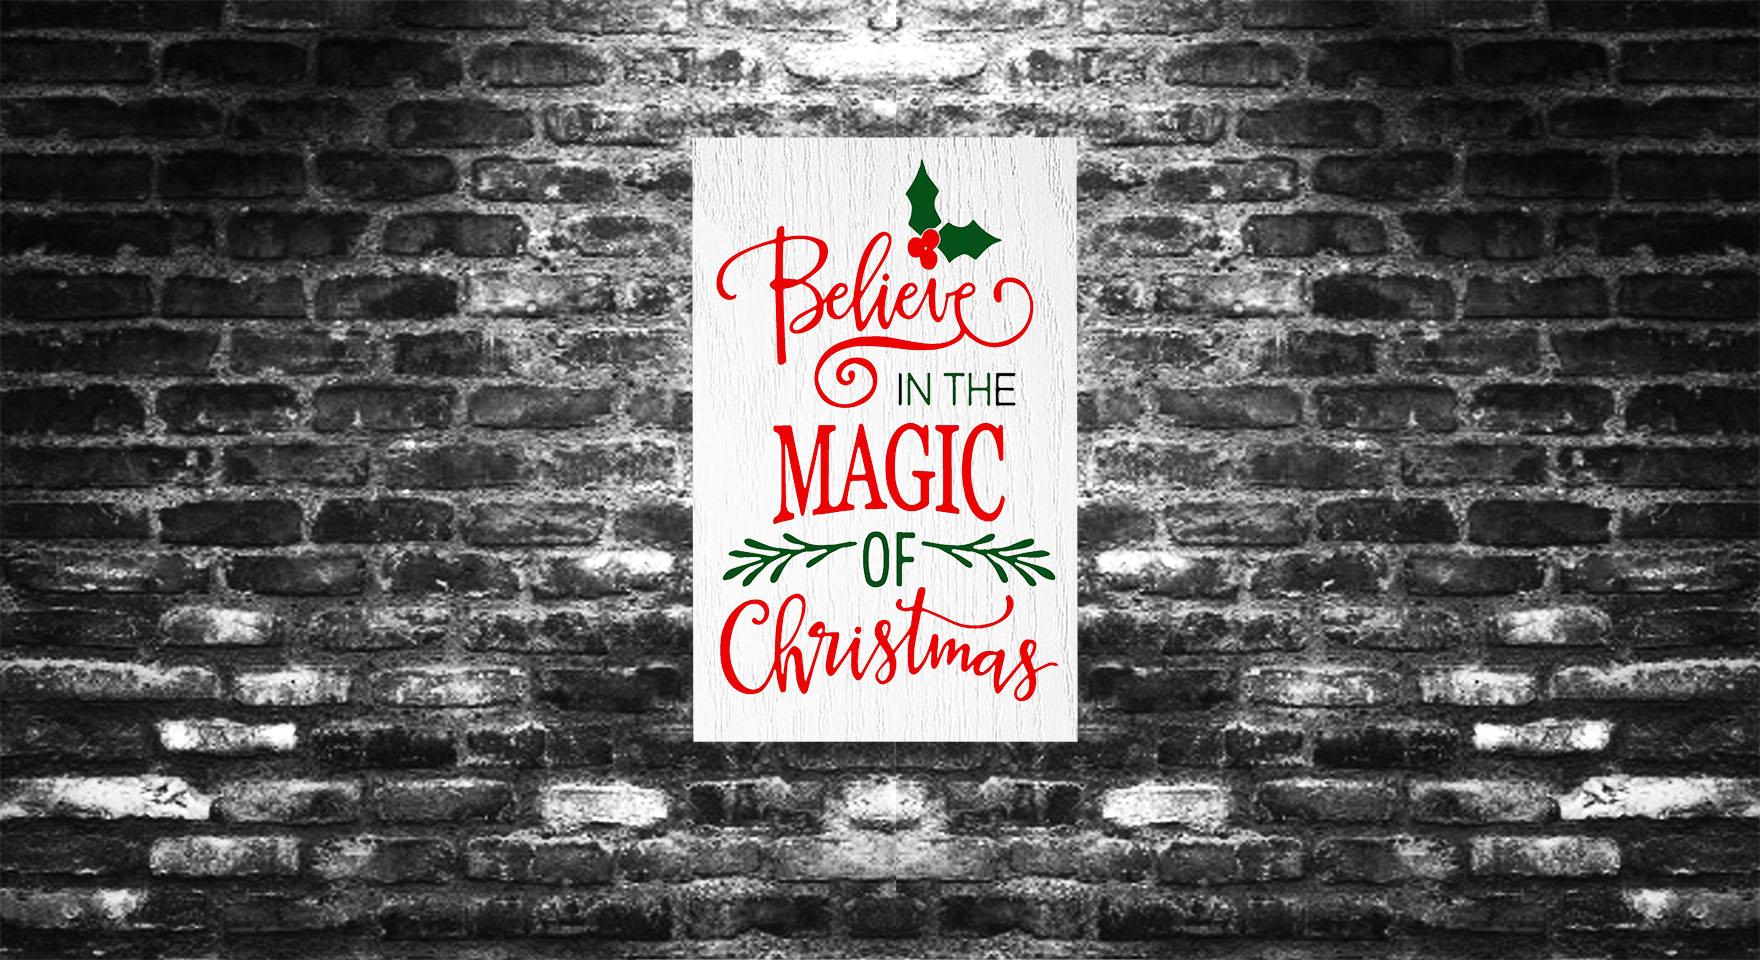 C3: Believe in the Magic